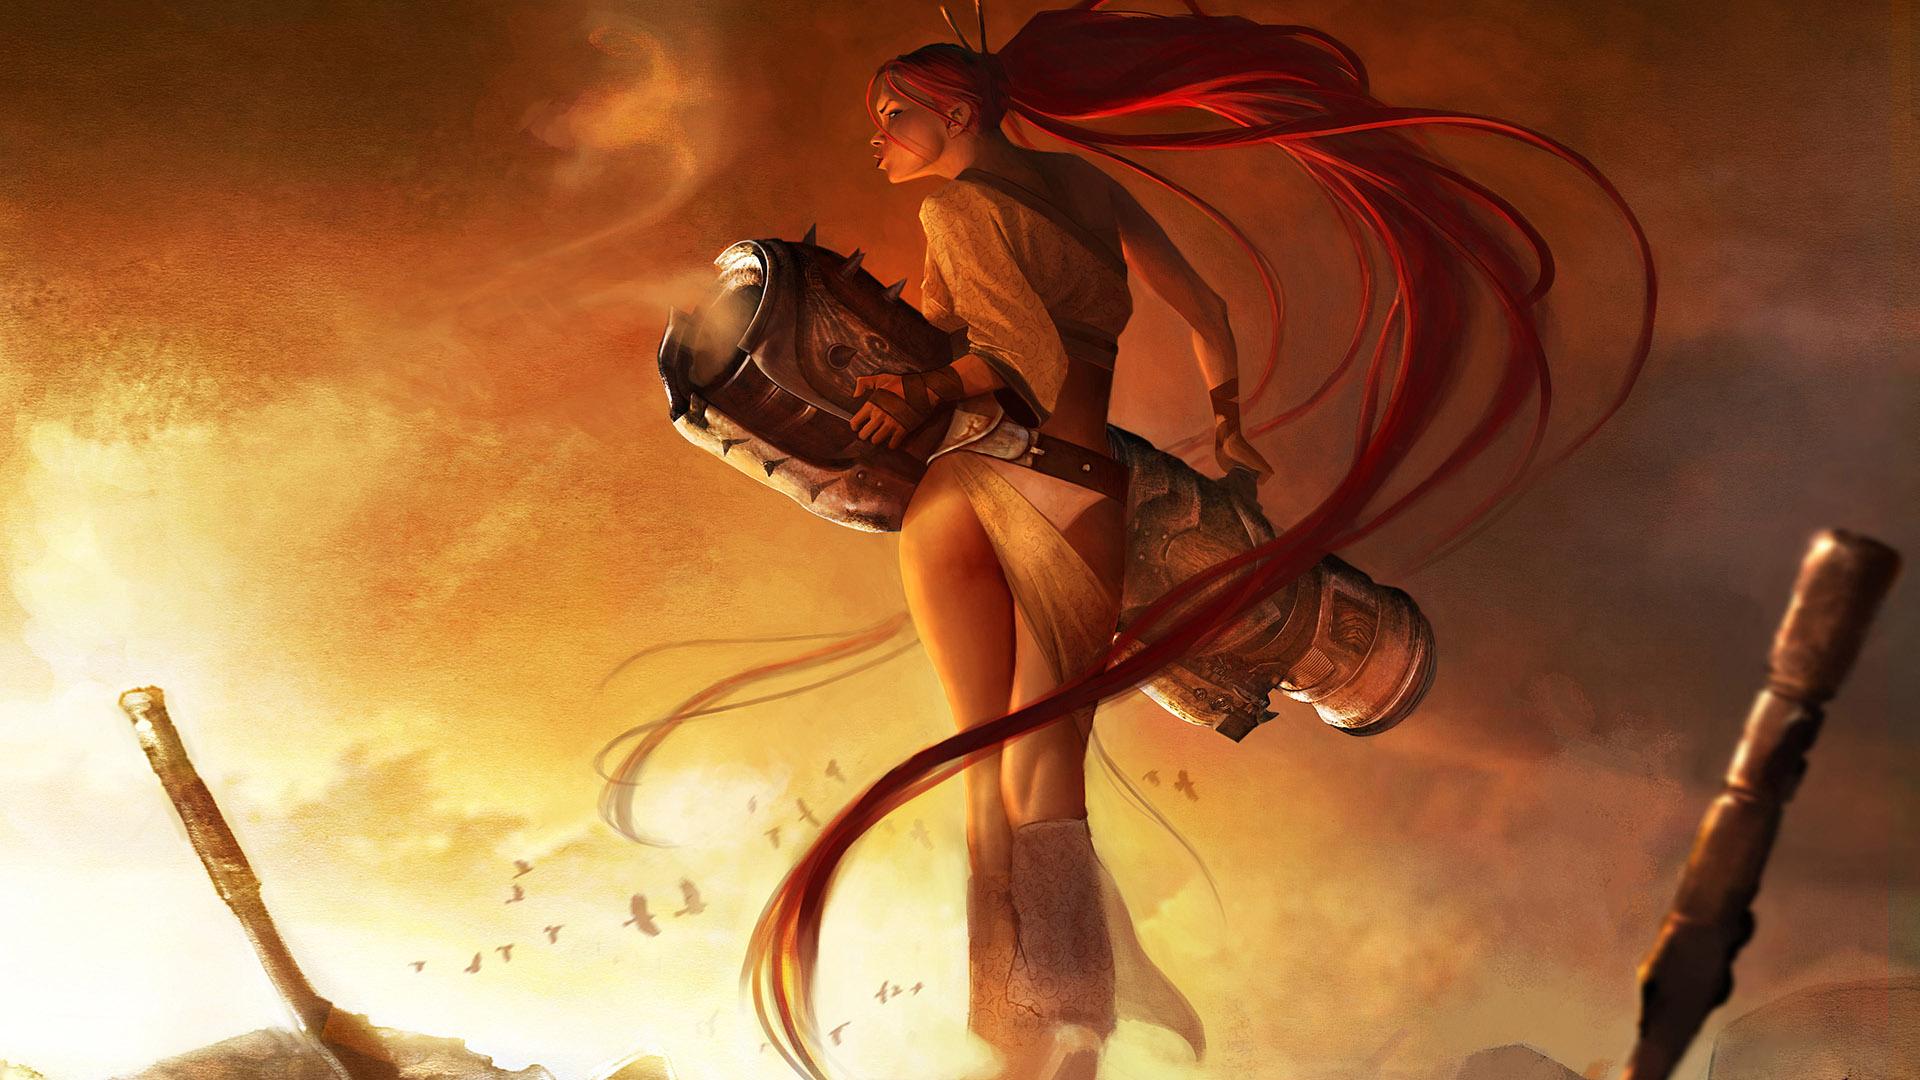 Video Game - Heavenly Sword  Beautiful Warrior CGI Game Ps3 Hair Smoke Blonde Wallpaper